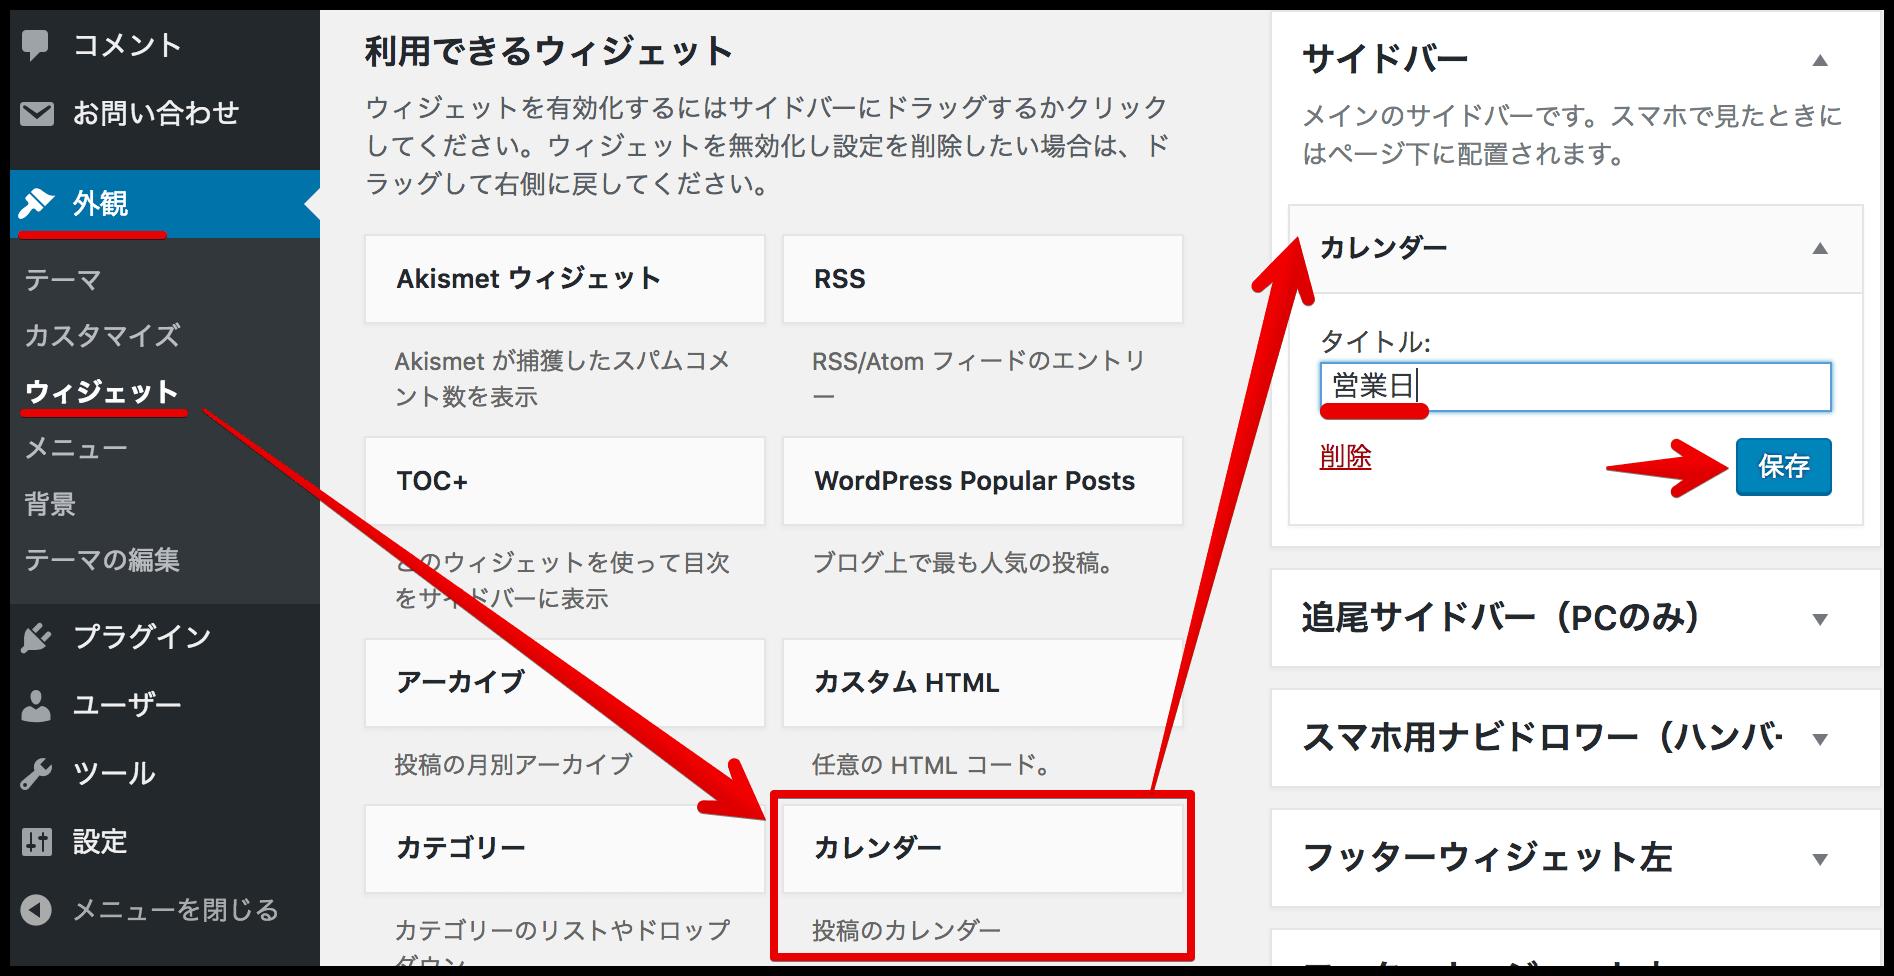 WordPressウィジェットカレンダー